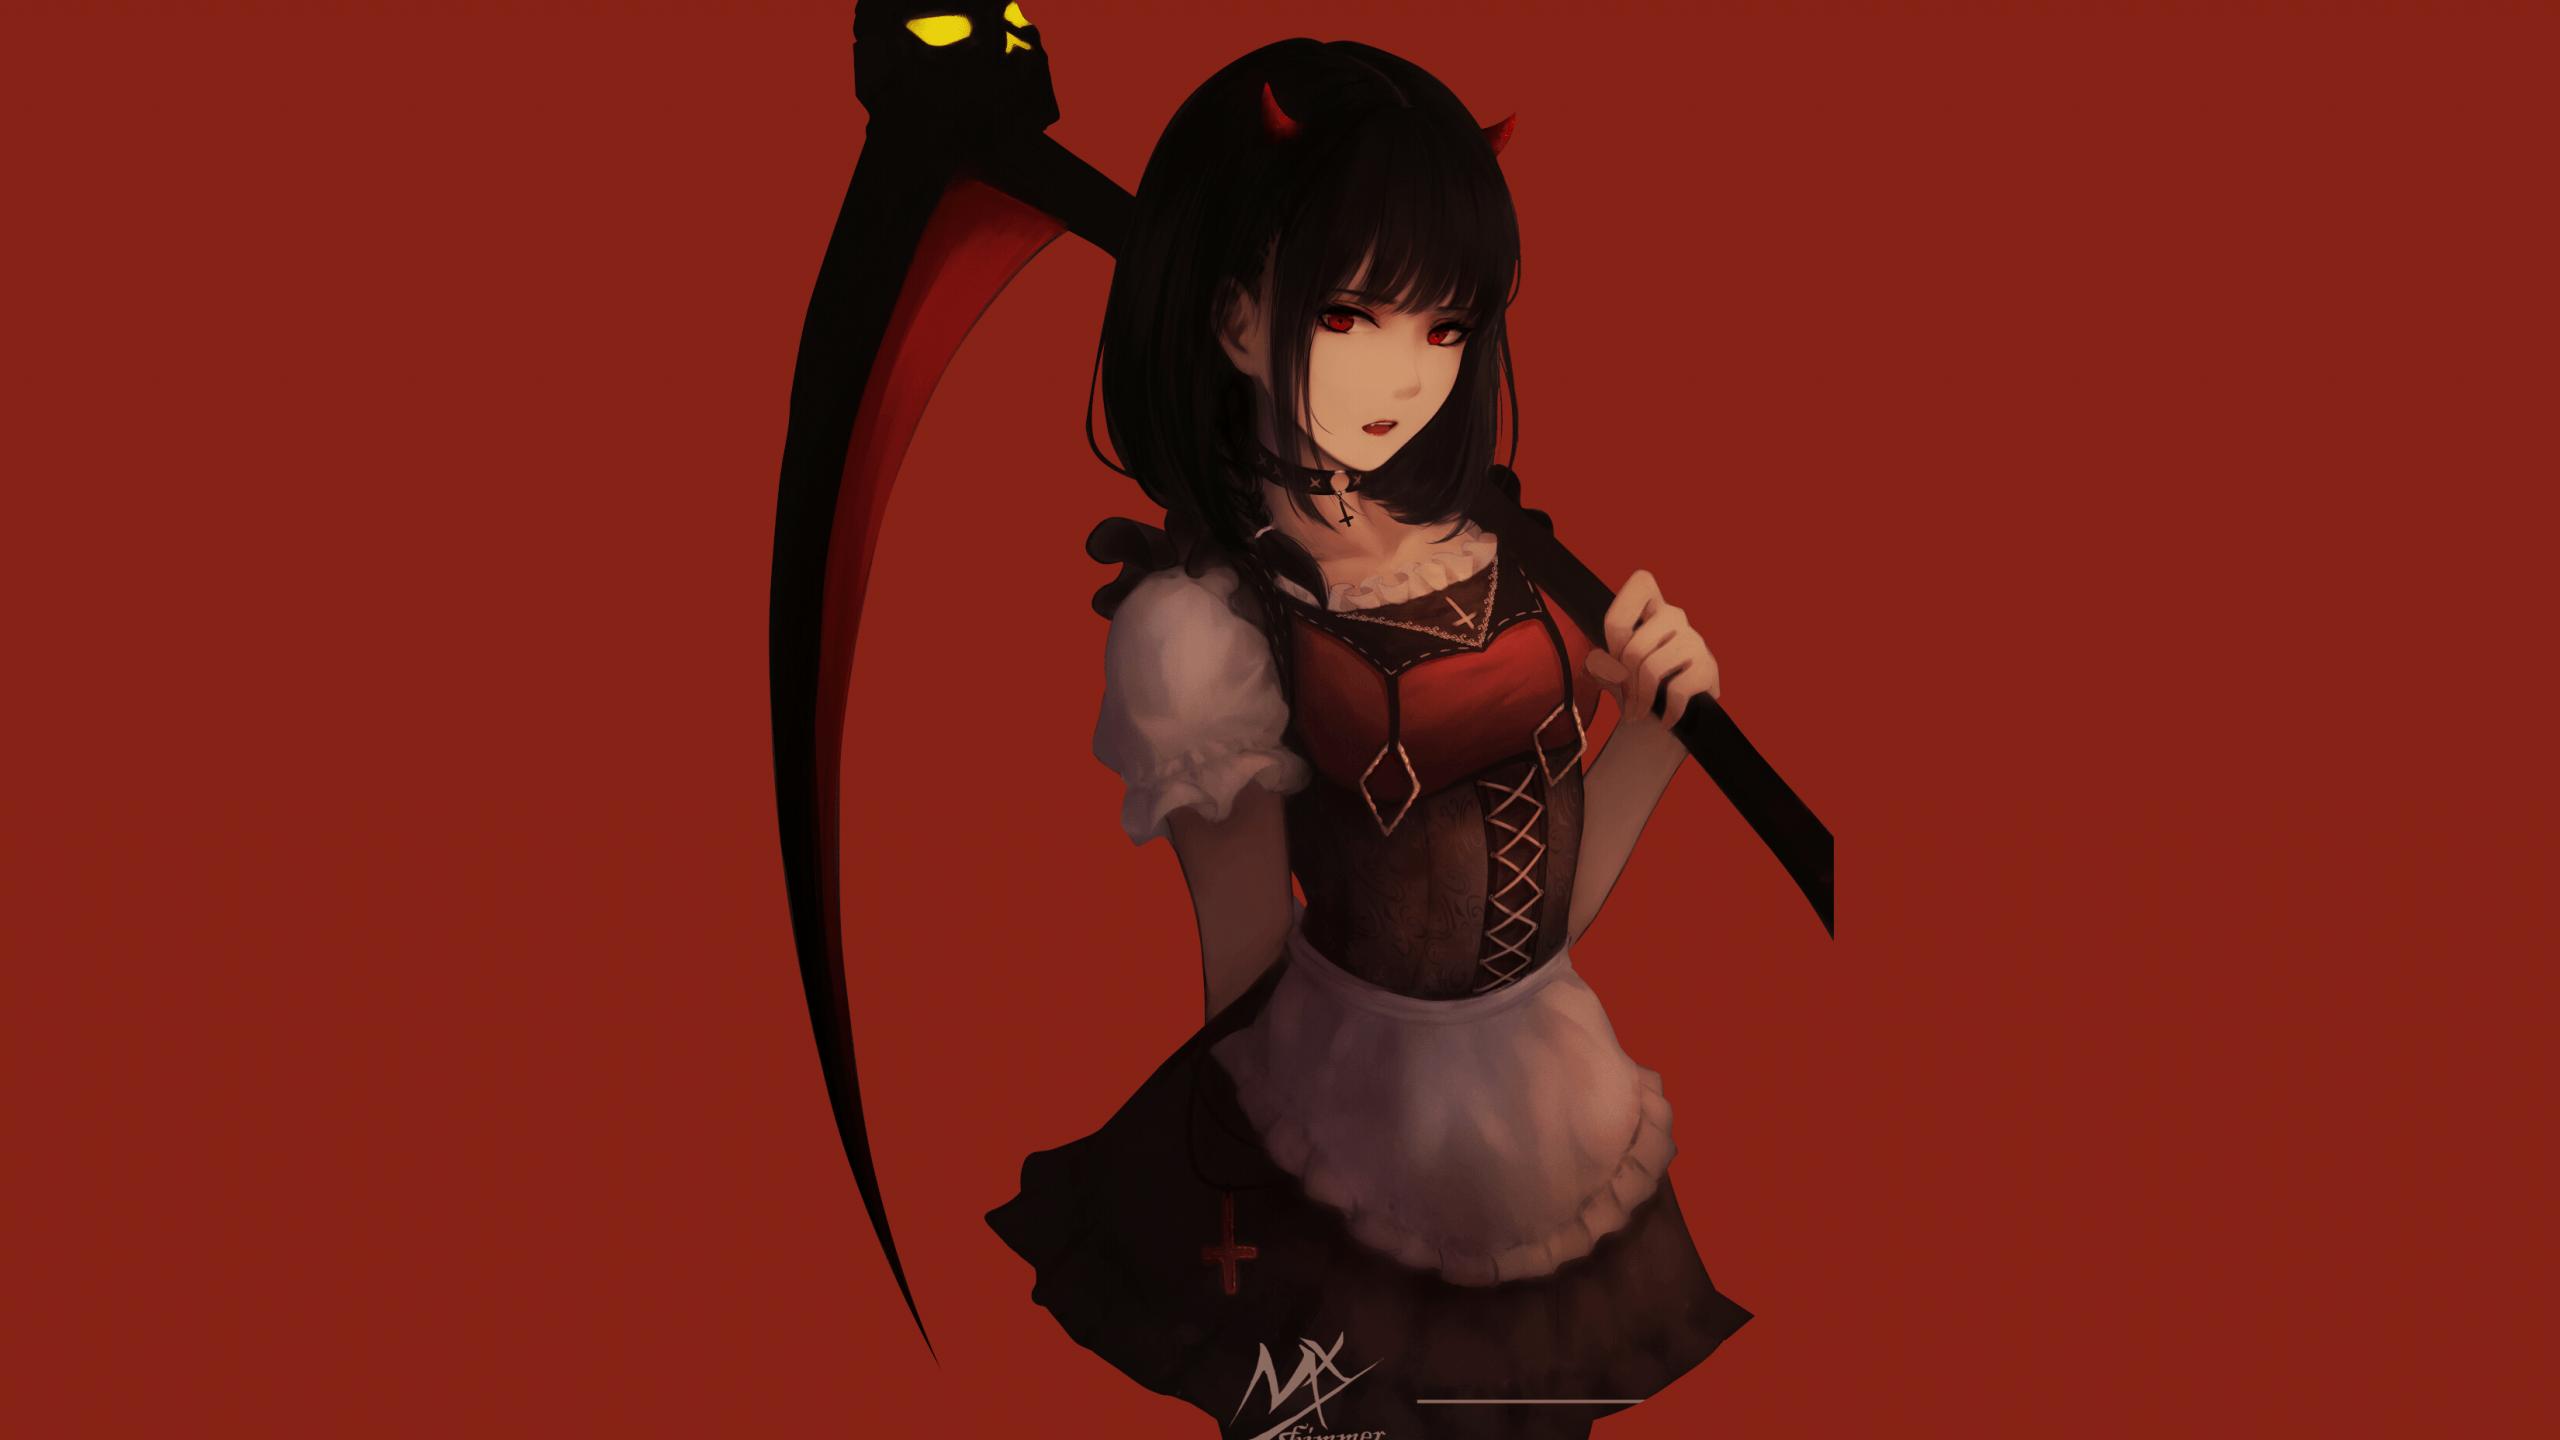 Black And Red Anime Wallpaper Hd Gambarku